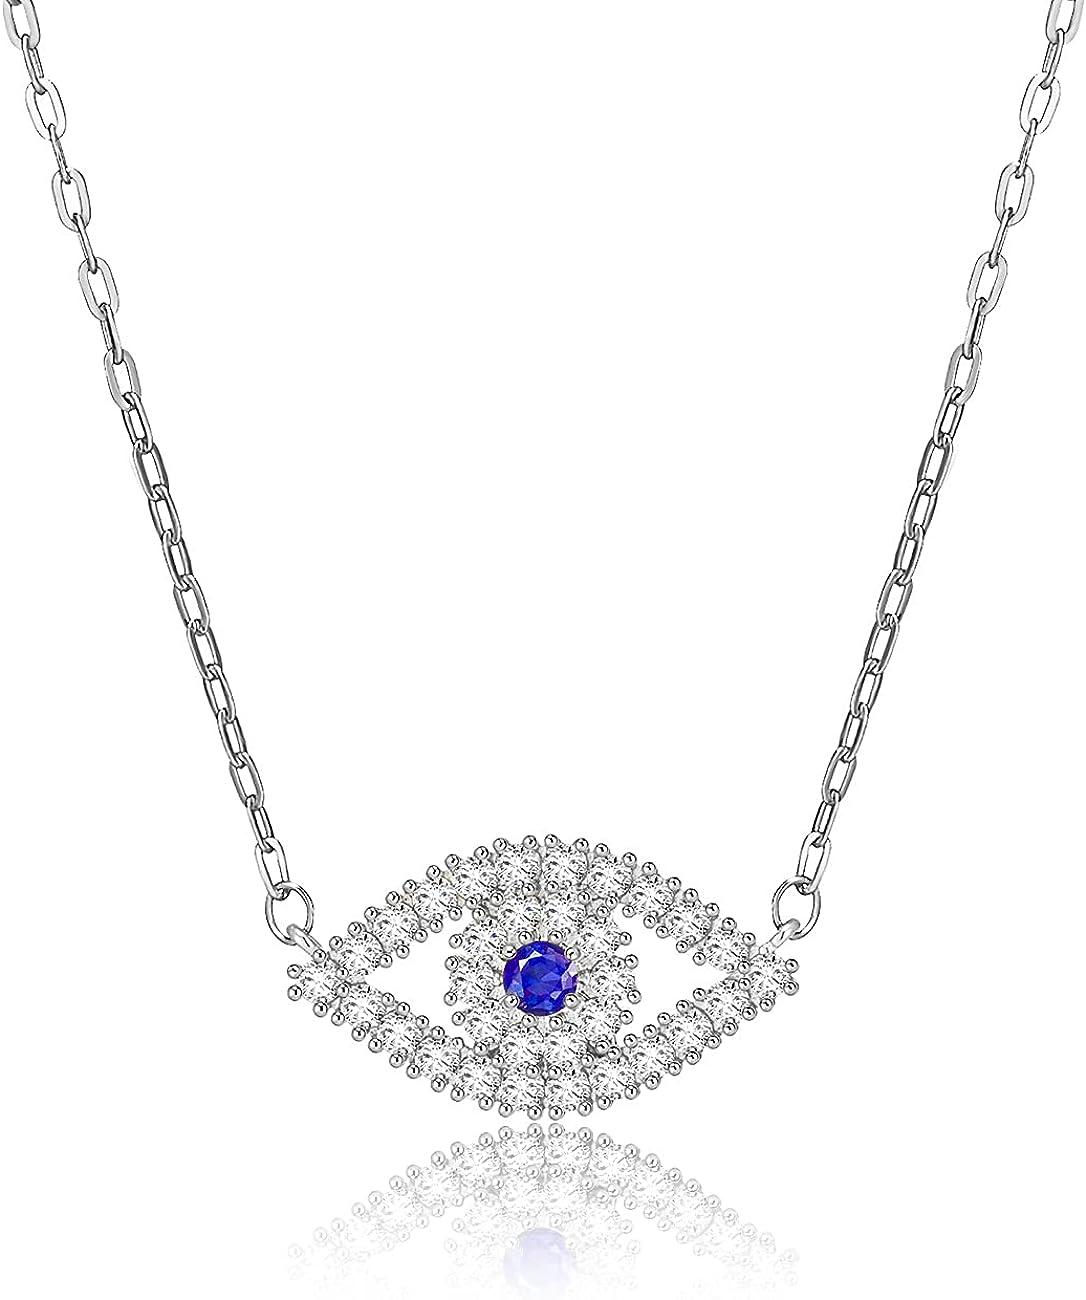 Apsvo Dainty Evil Eye Pendant Cross Necklace Max 83% OFF Very popular Infinity